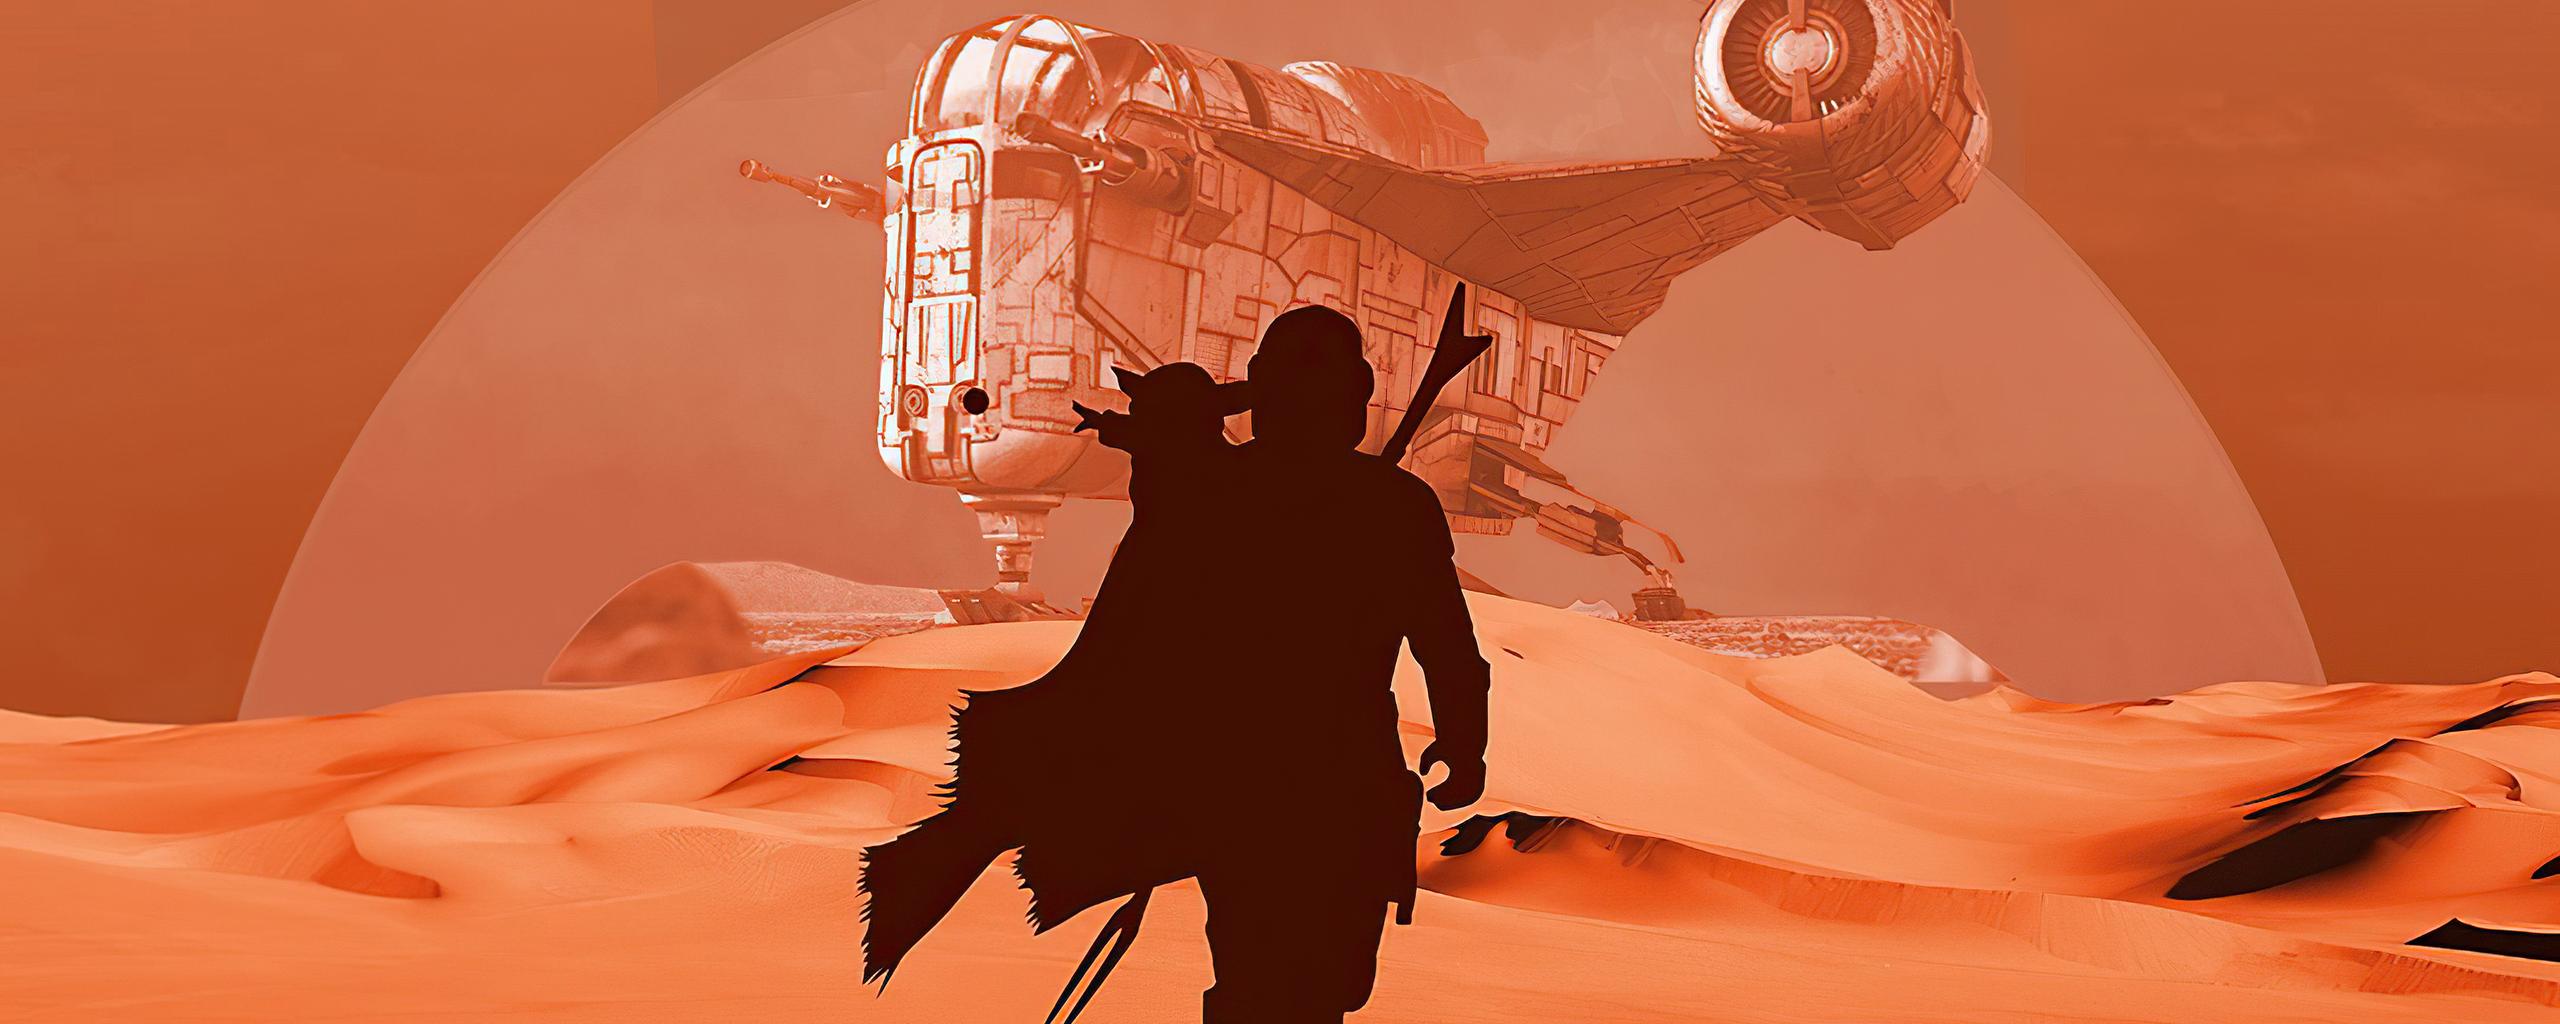 the-mandalorian-star-wars-4k-hy.jpg